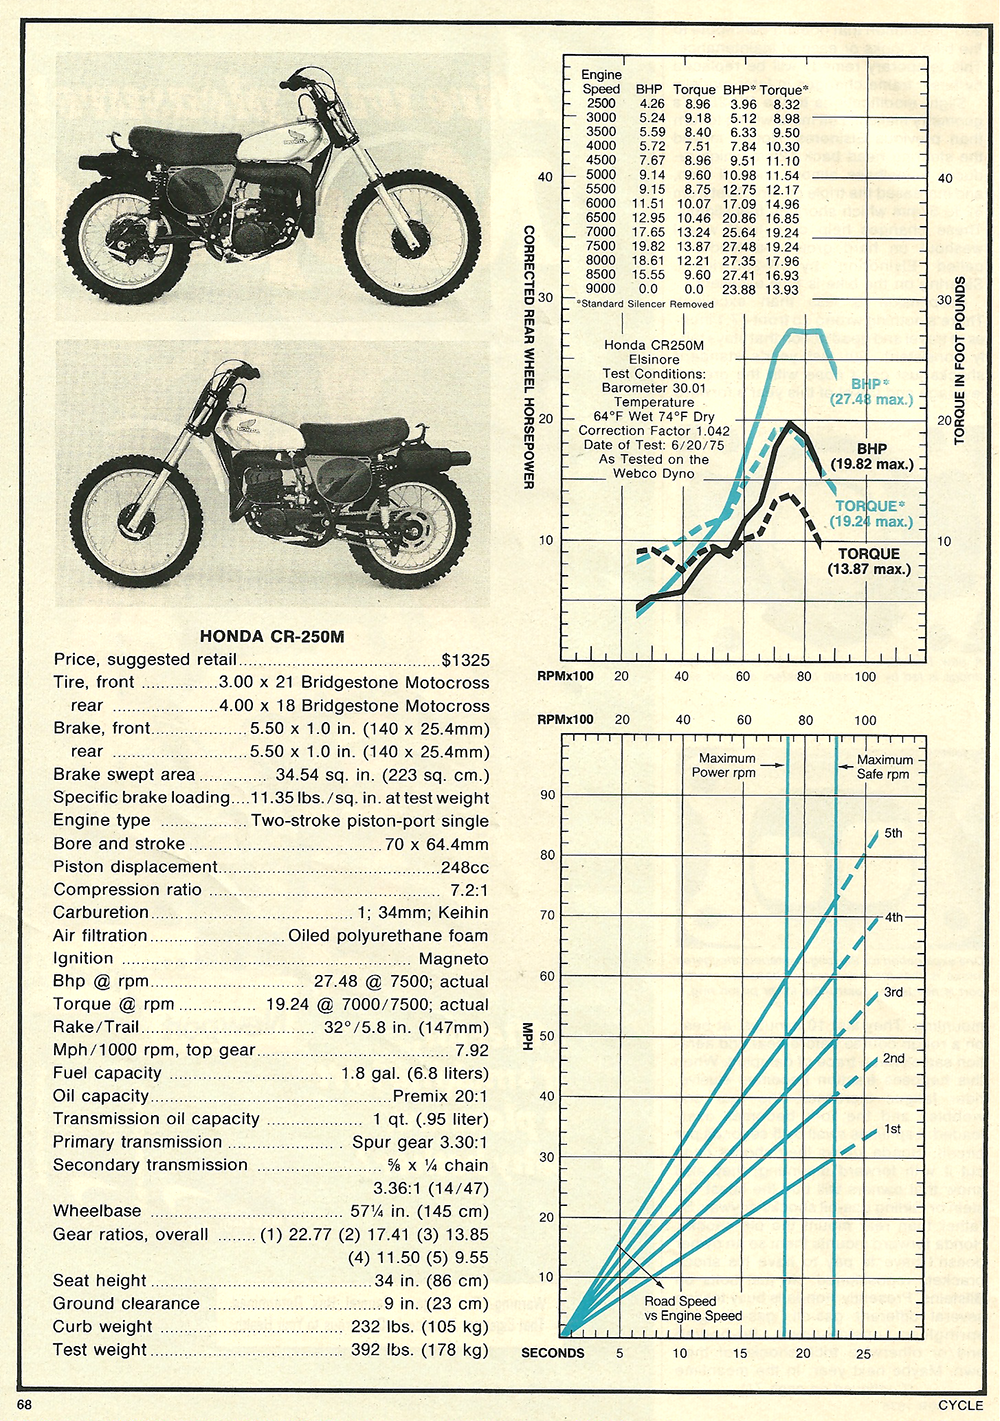 1975 Honda CR250M road test 5.png